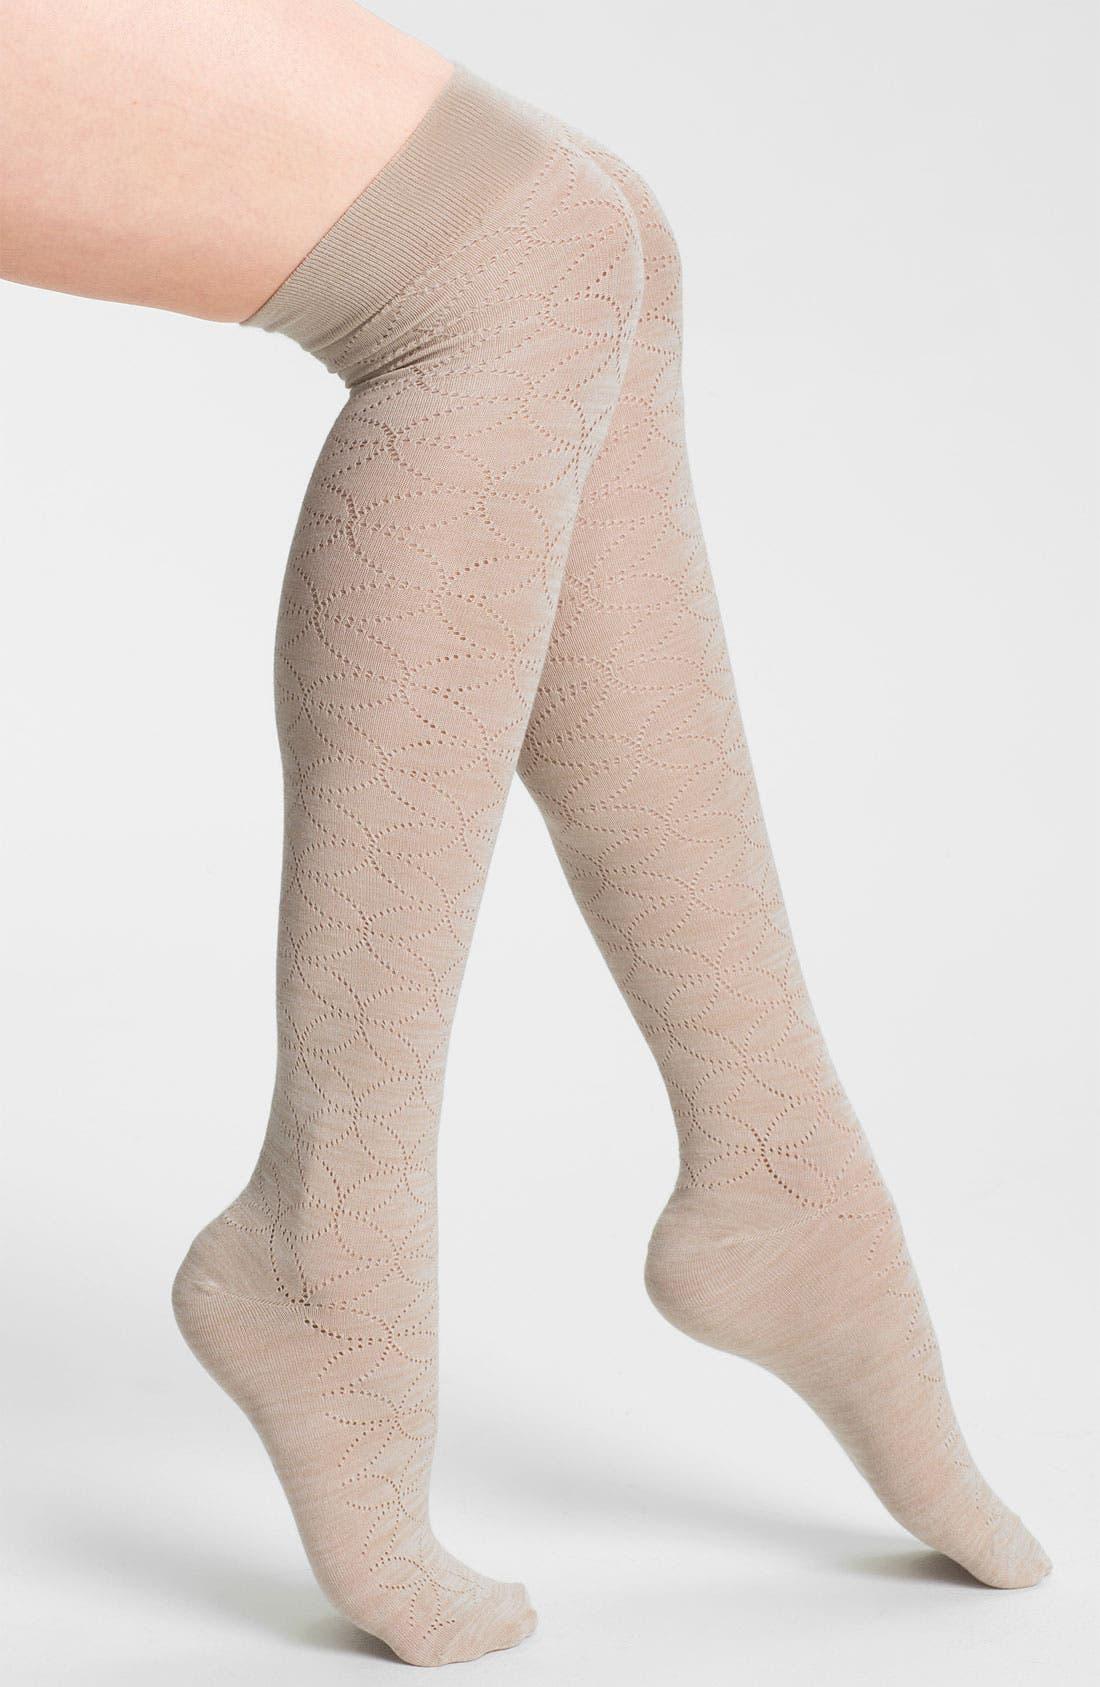 Main Image - Nordstrom 'Inside the Lines' Over the Knee Socks